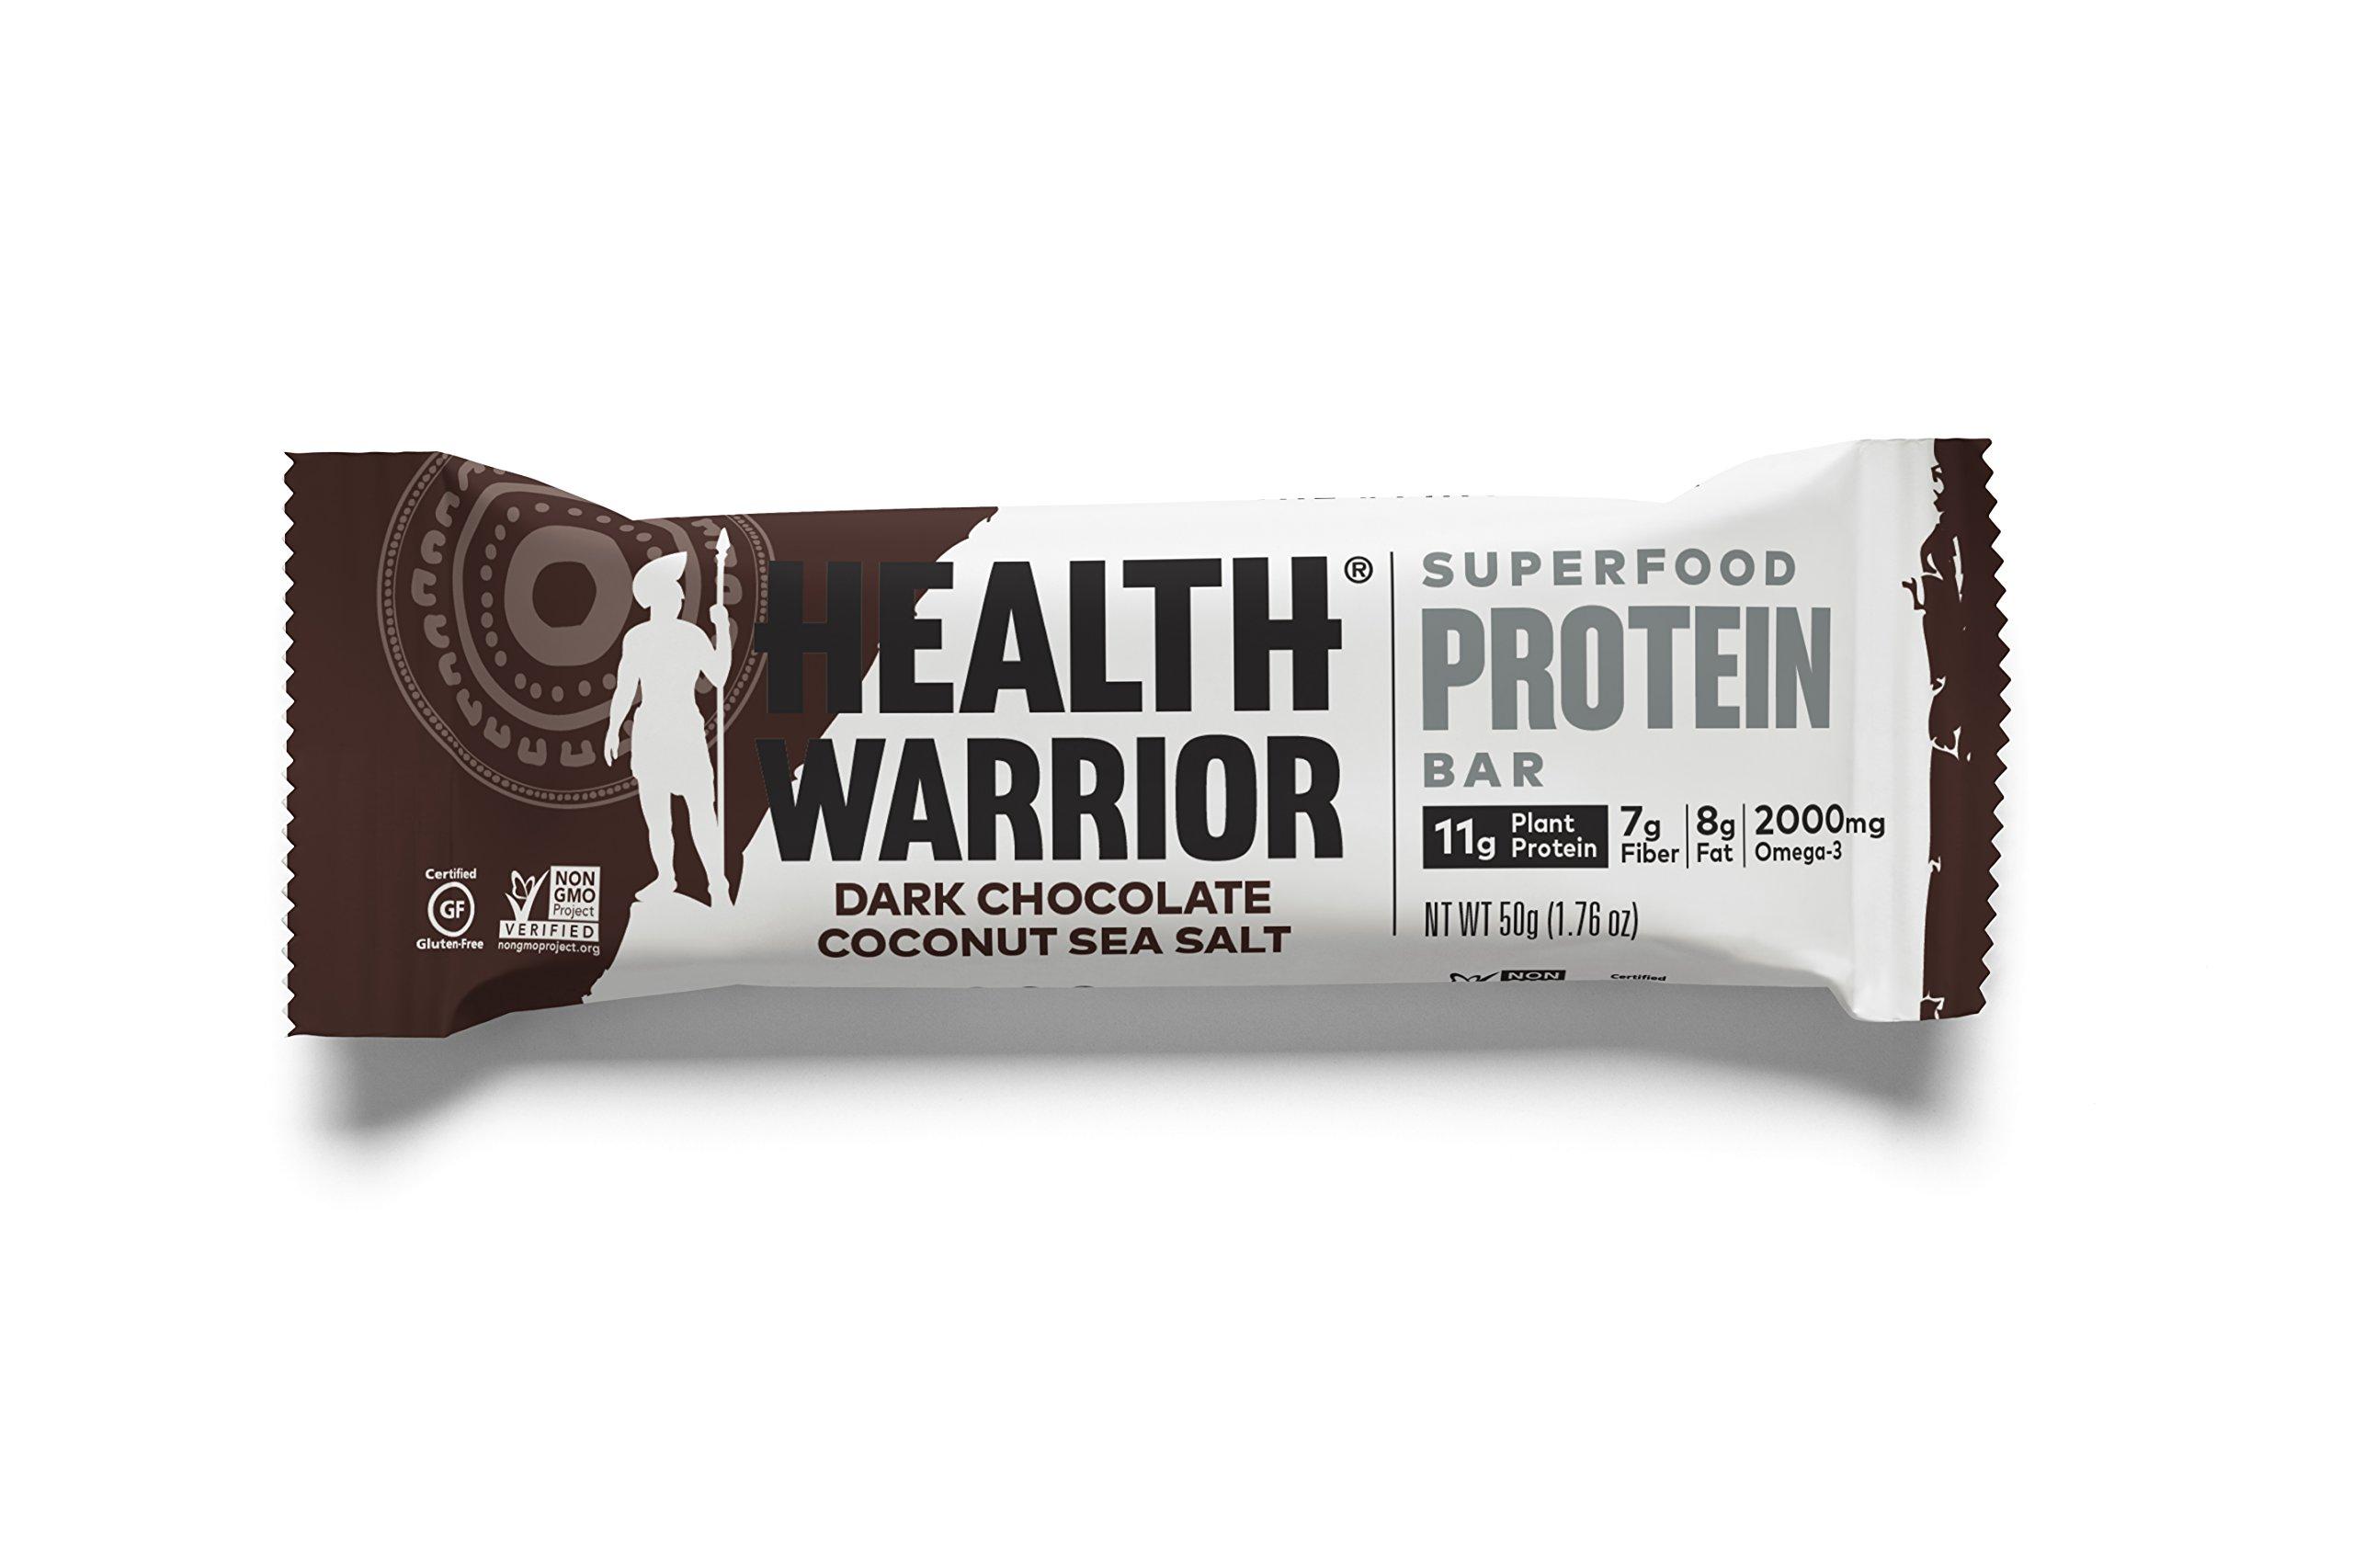 HEALTH WARRIOR Superfood Protein Bars, Dark Chocolate Coconut Sea Salt, Plant-Based Protein, 50g bars, 12 count